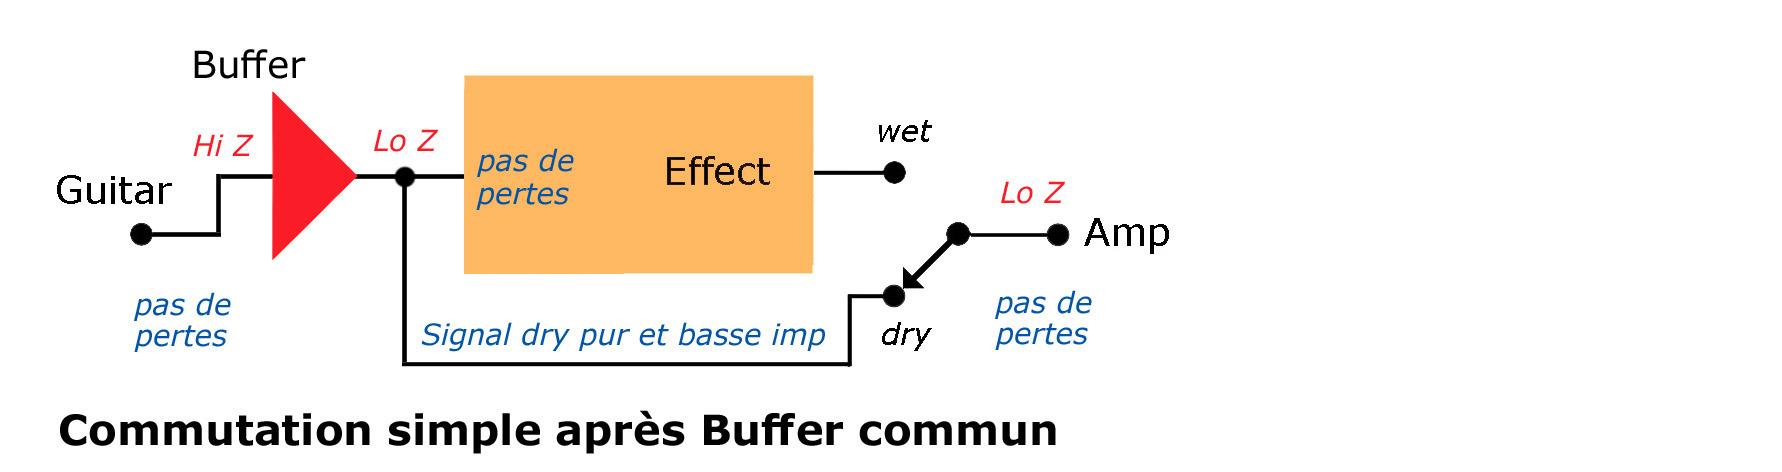 input buffers guitar poppa rh guitarpoppa com Finding Impedance in Circuits Impedance of a Circuit